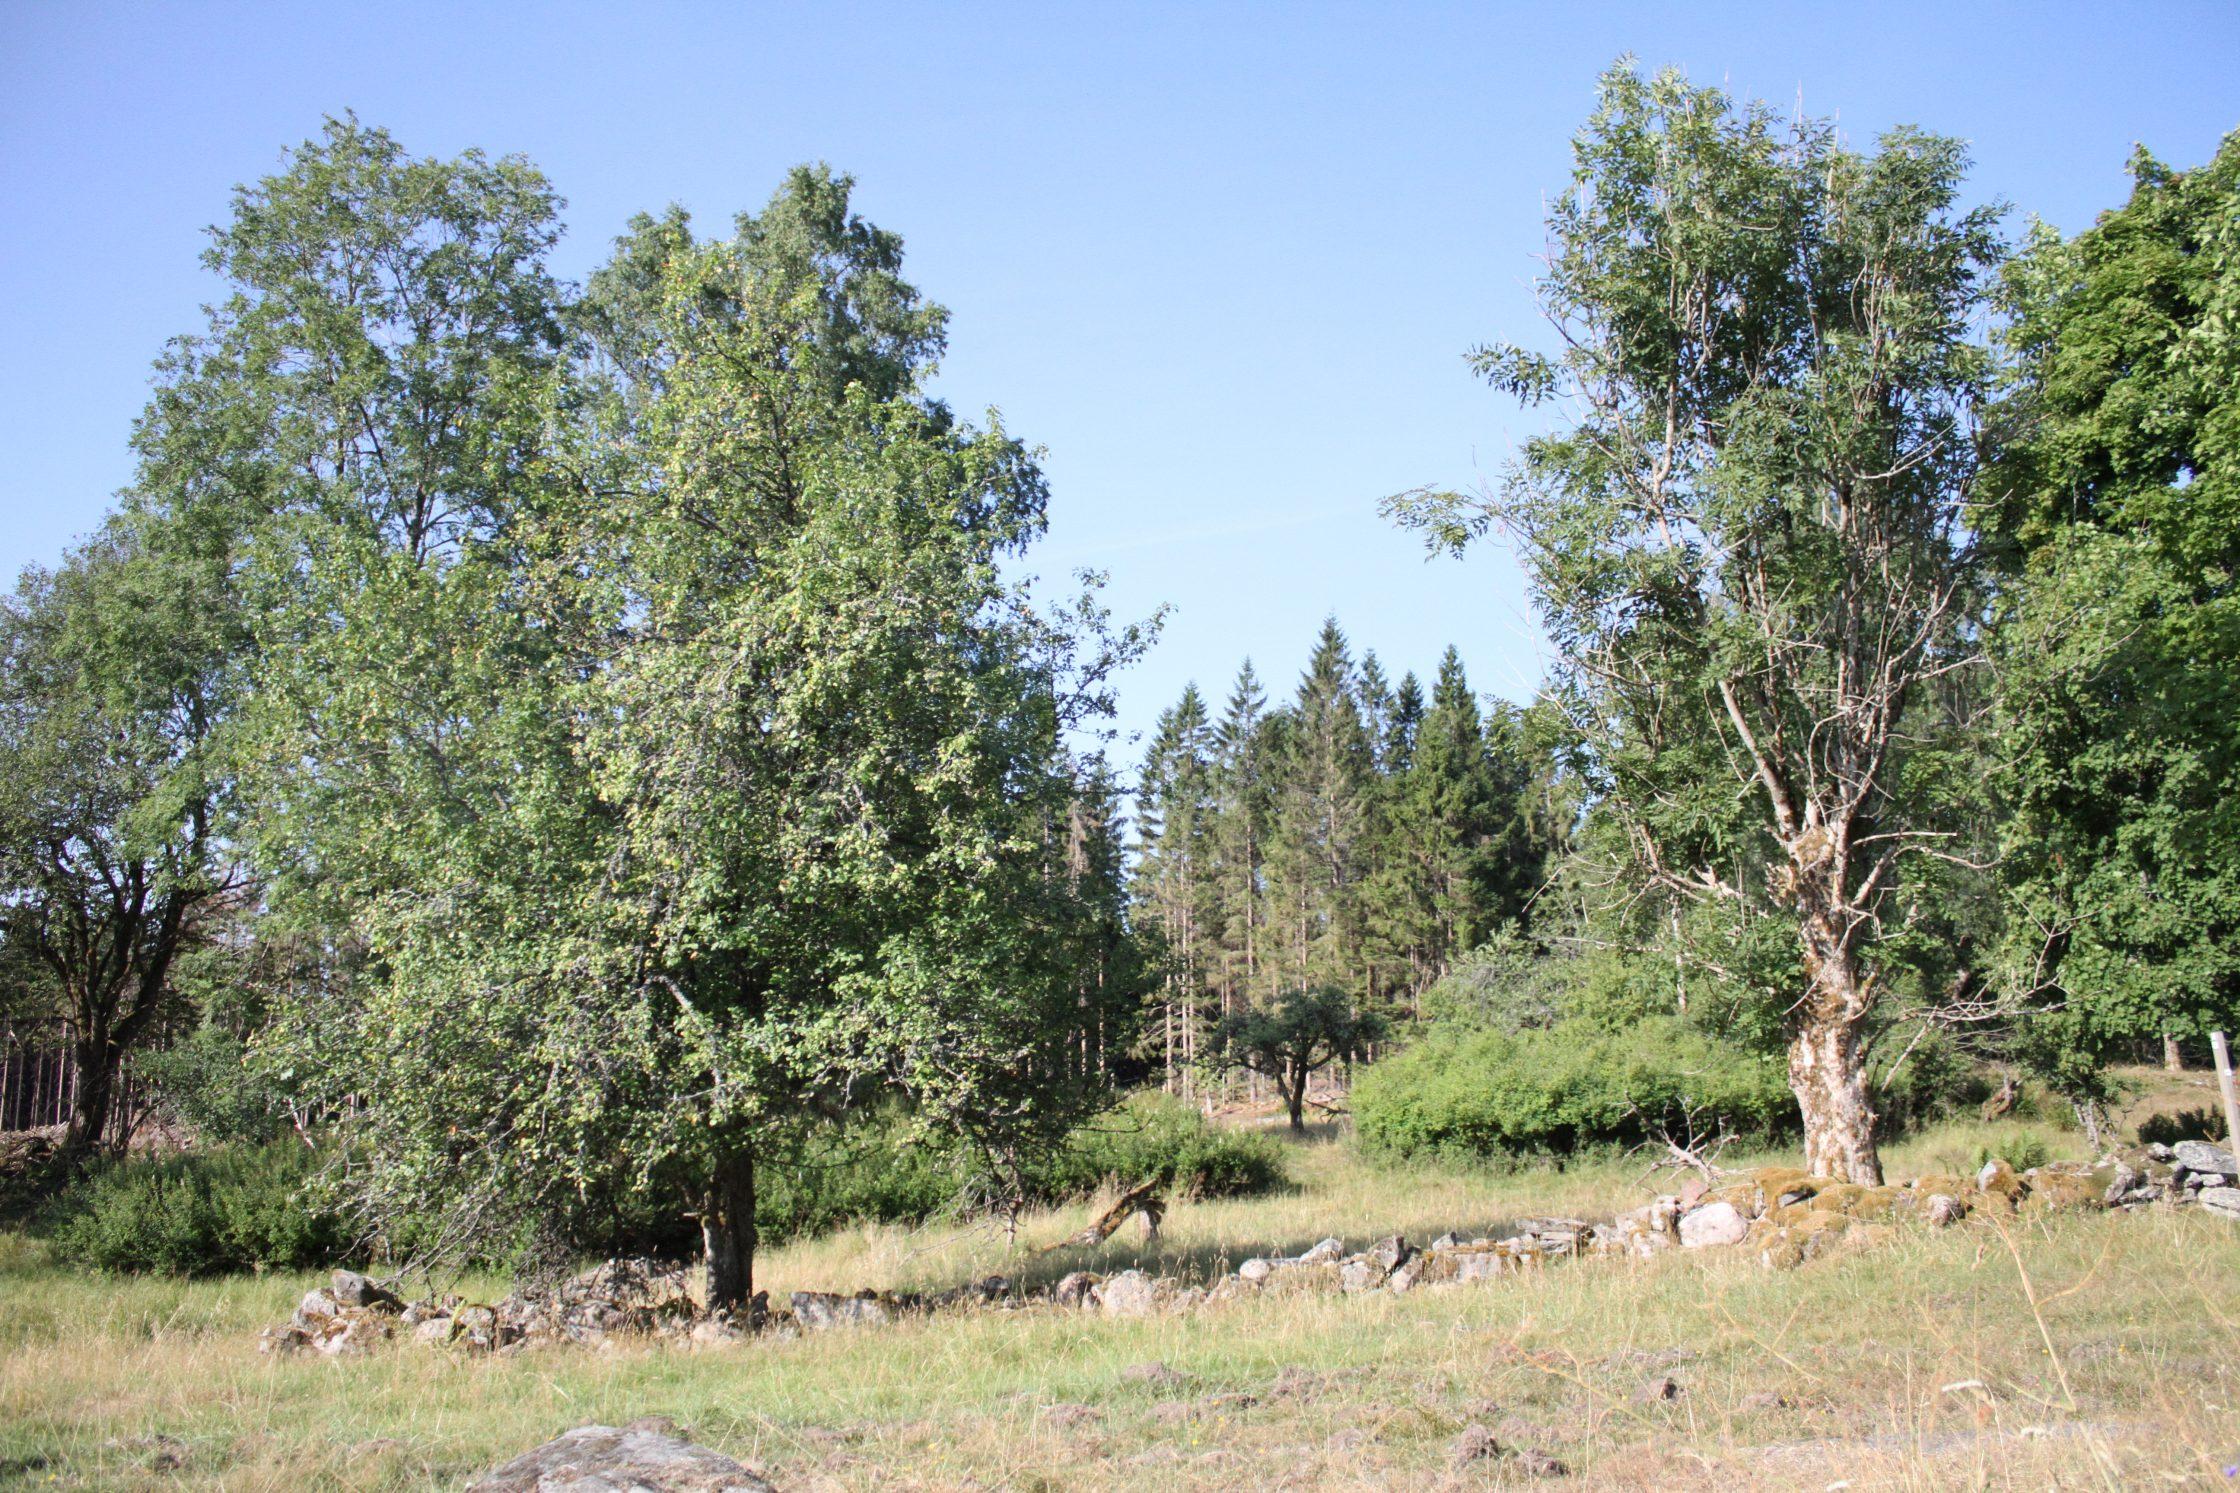 Naturvårdsområdet Idåsen